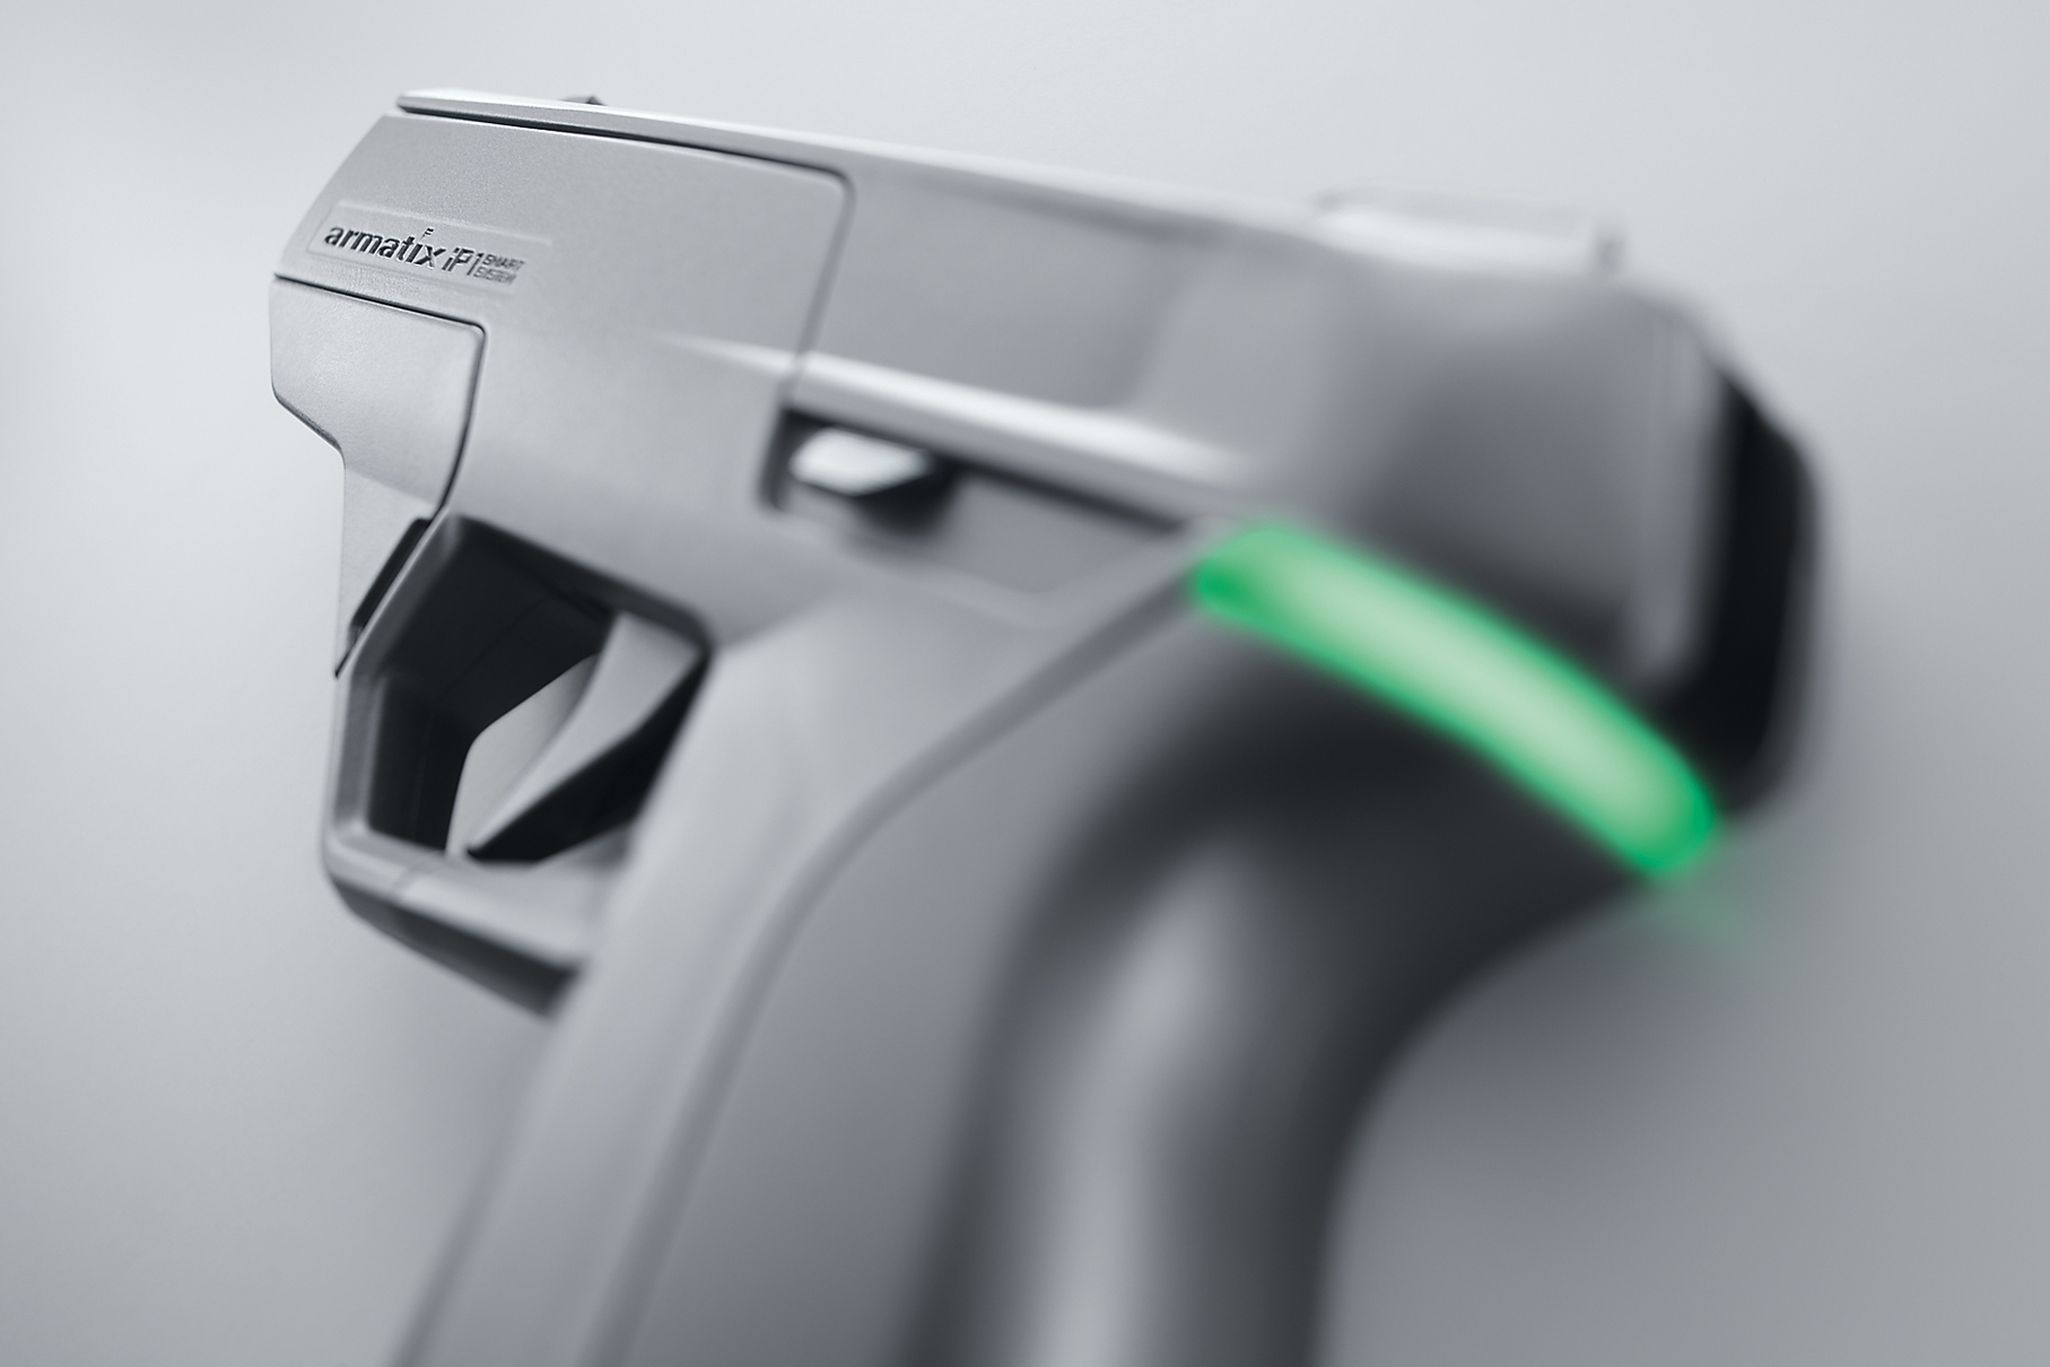 Gun Control The Nra Wants To Take Americas Smart Guns Away The Verge